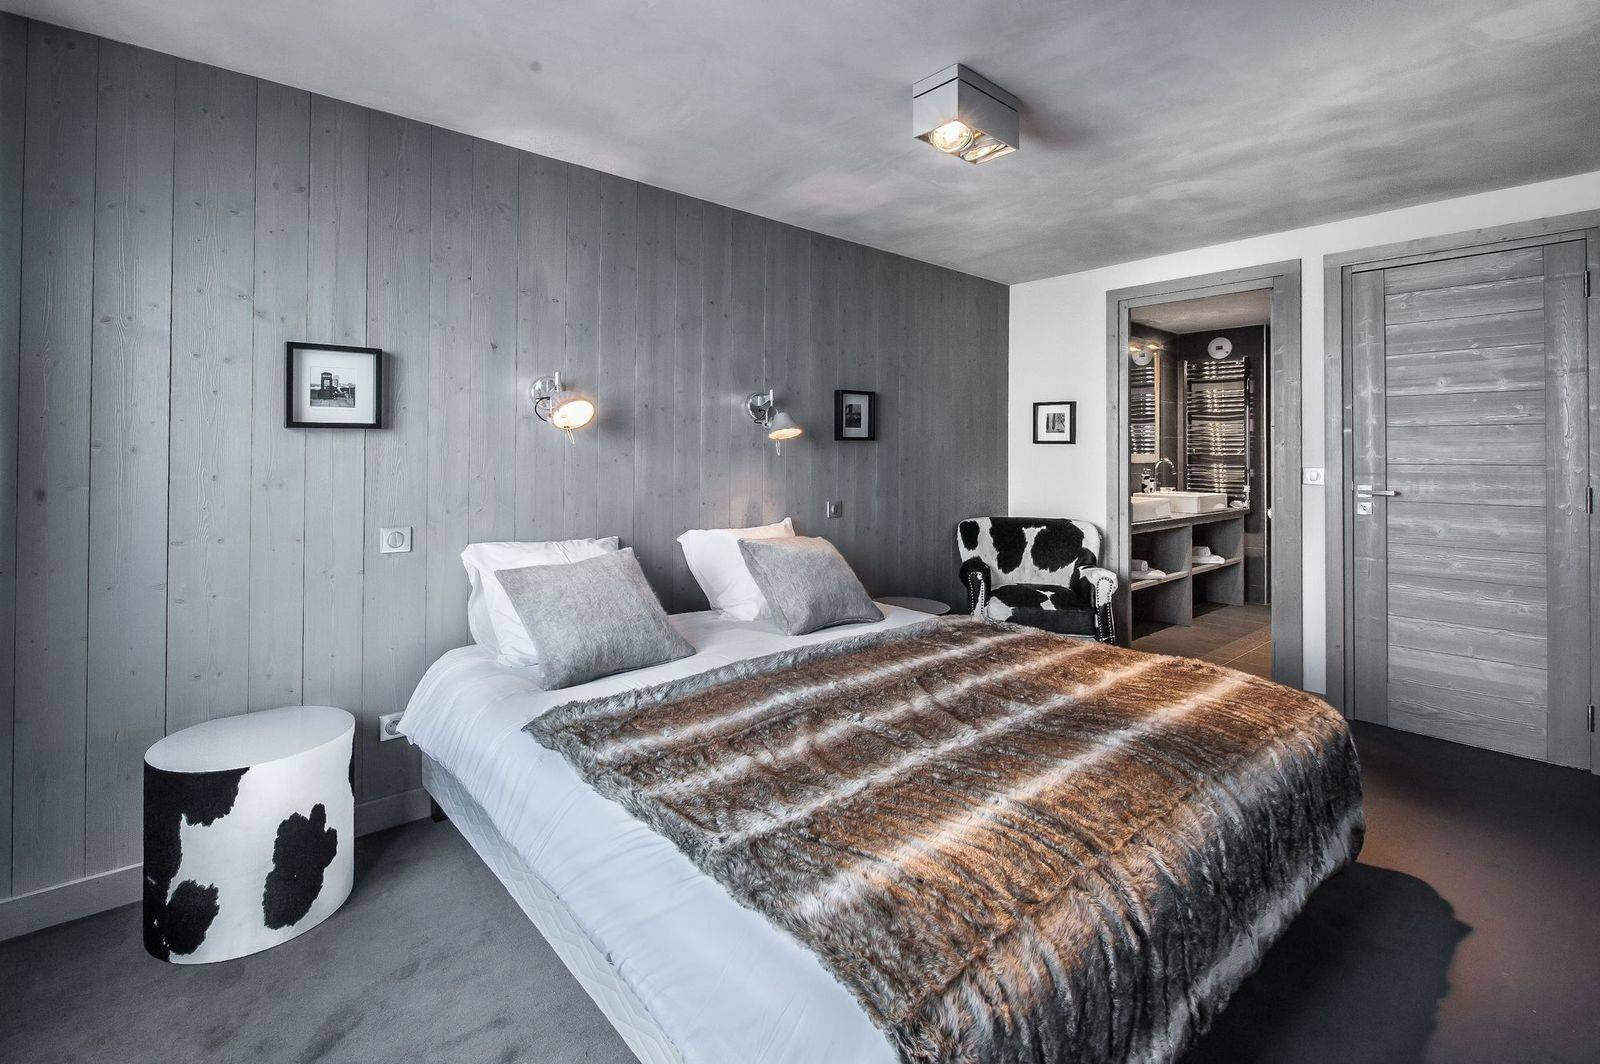 Courchevel 1650 Location Appartement Luxe Neustadelite Chambre 3